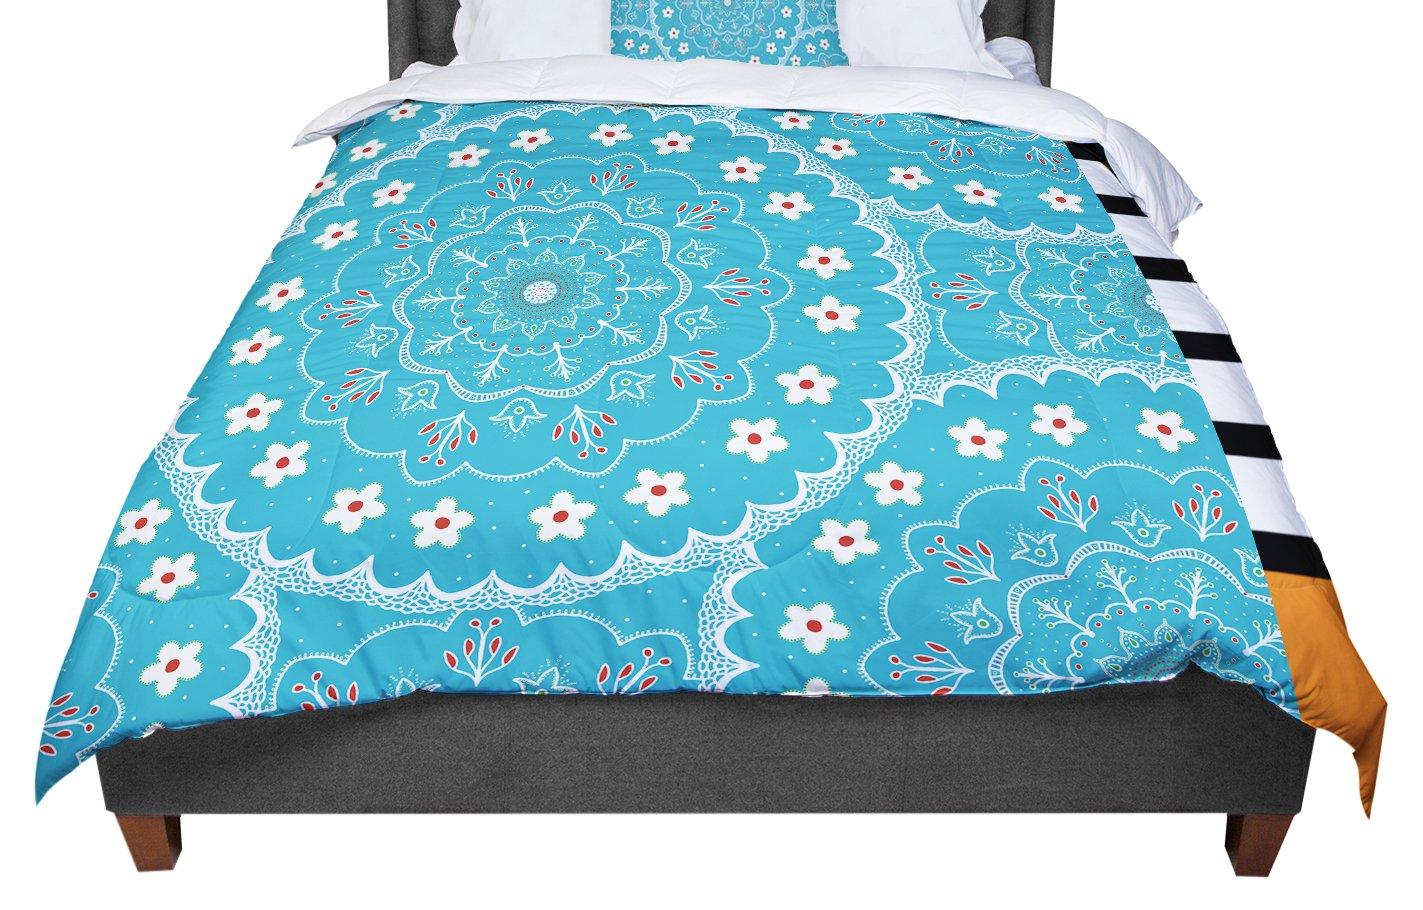 104 X 88 Cal King Comforter KESS InHouse Iris Lehnhardt Mandala II Blue Abstract King